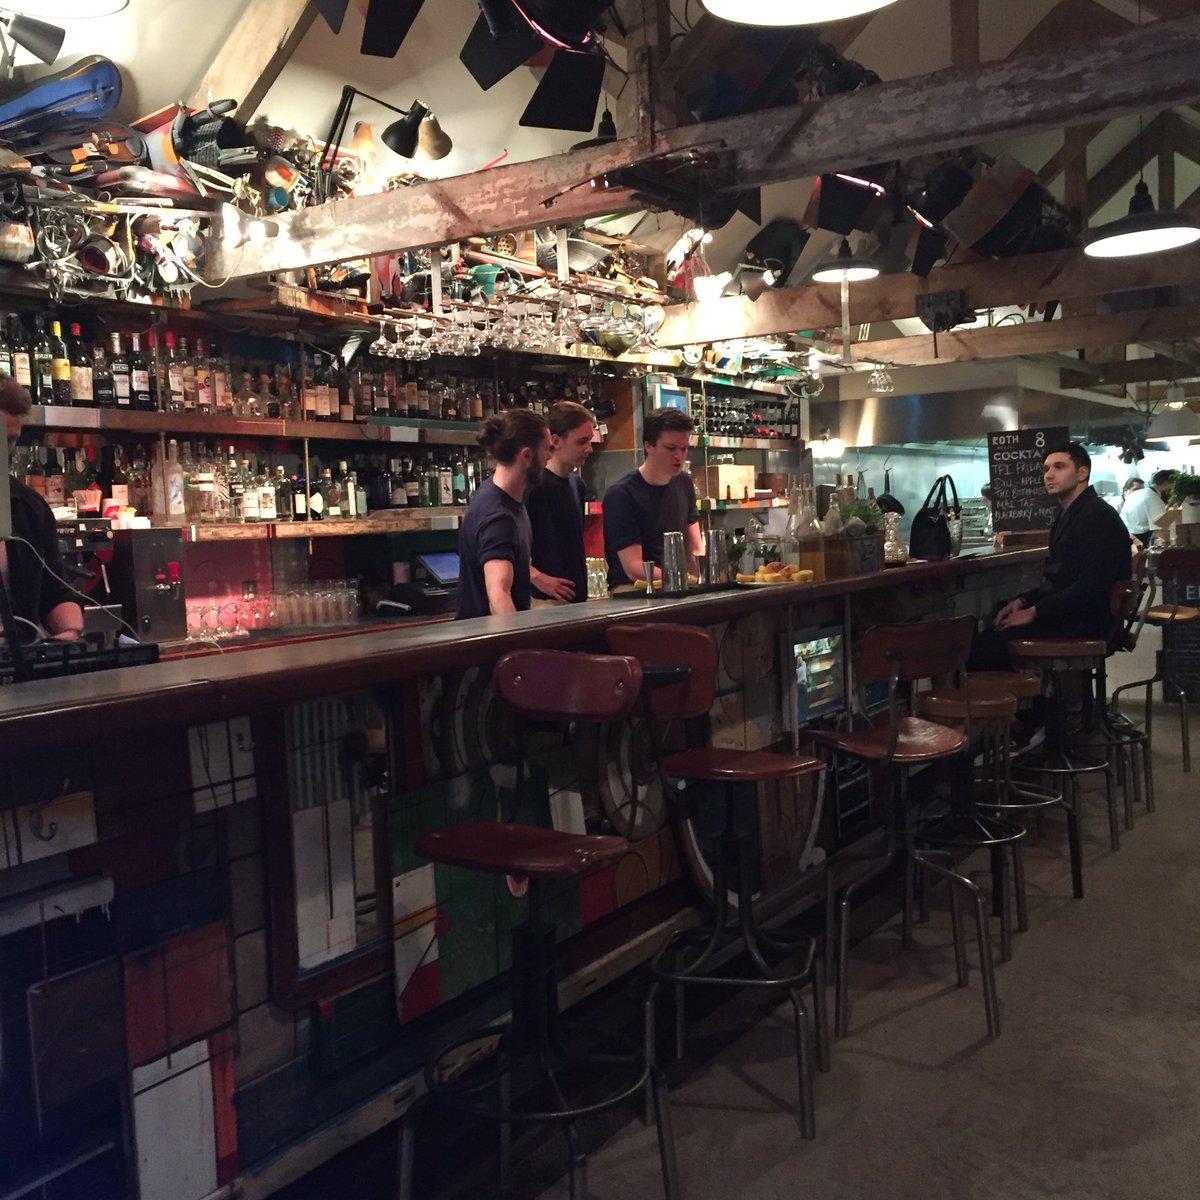 Love Rothbar in Bruton ... perfect setting for a winefestival! https://t.co/pIja6J0jMU